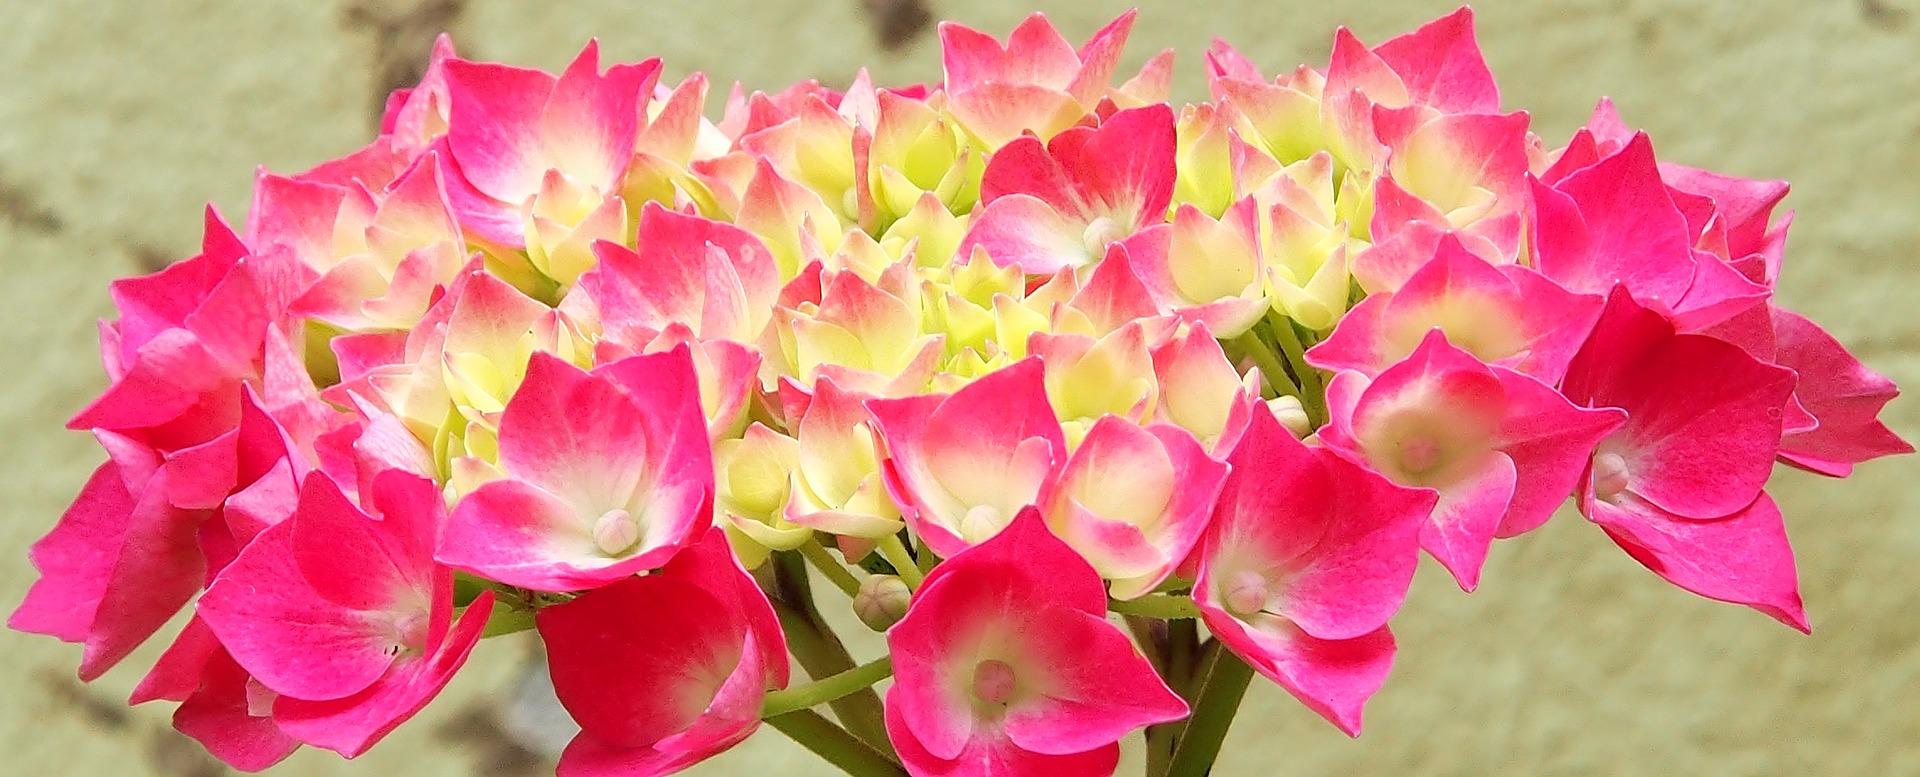 hydrangeas-uk-spring-flowers-london-uk-gift-delivery-london-florist-blog